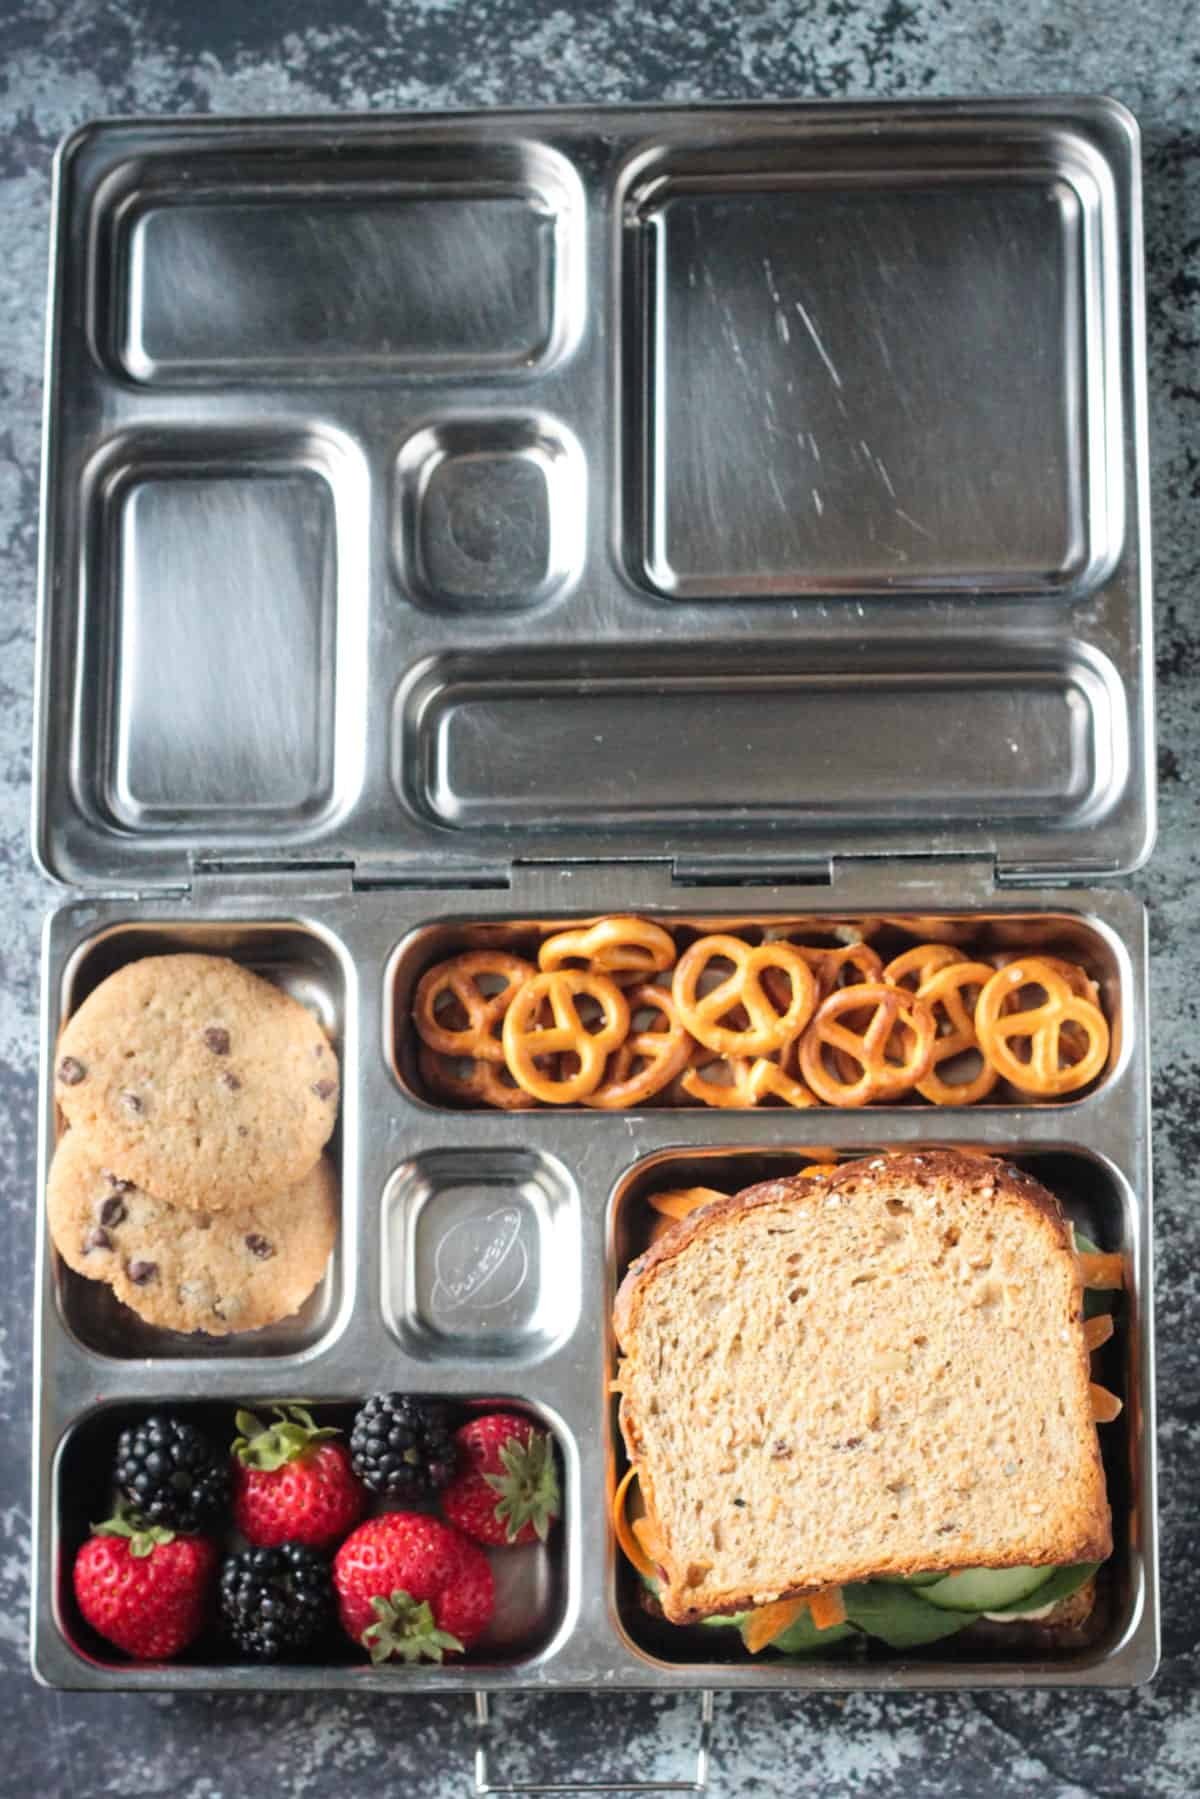 Vegan lunch box with hummus veggie sandwich, strawberries, blackberries, pretzels, chocolate chip cookies.